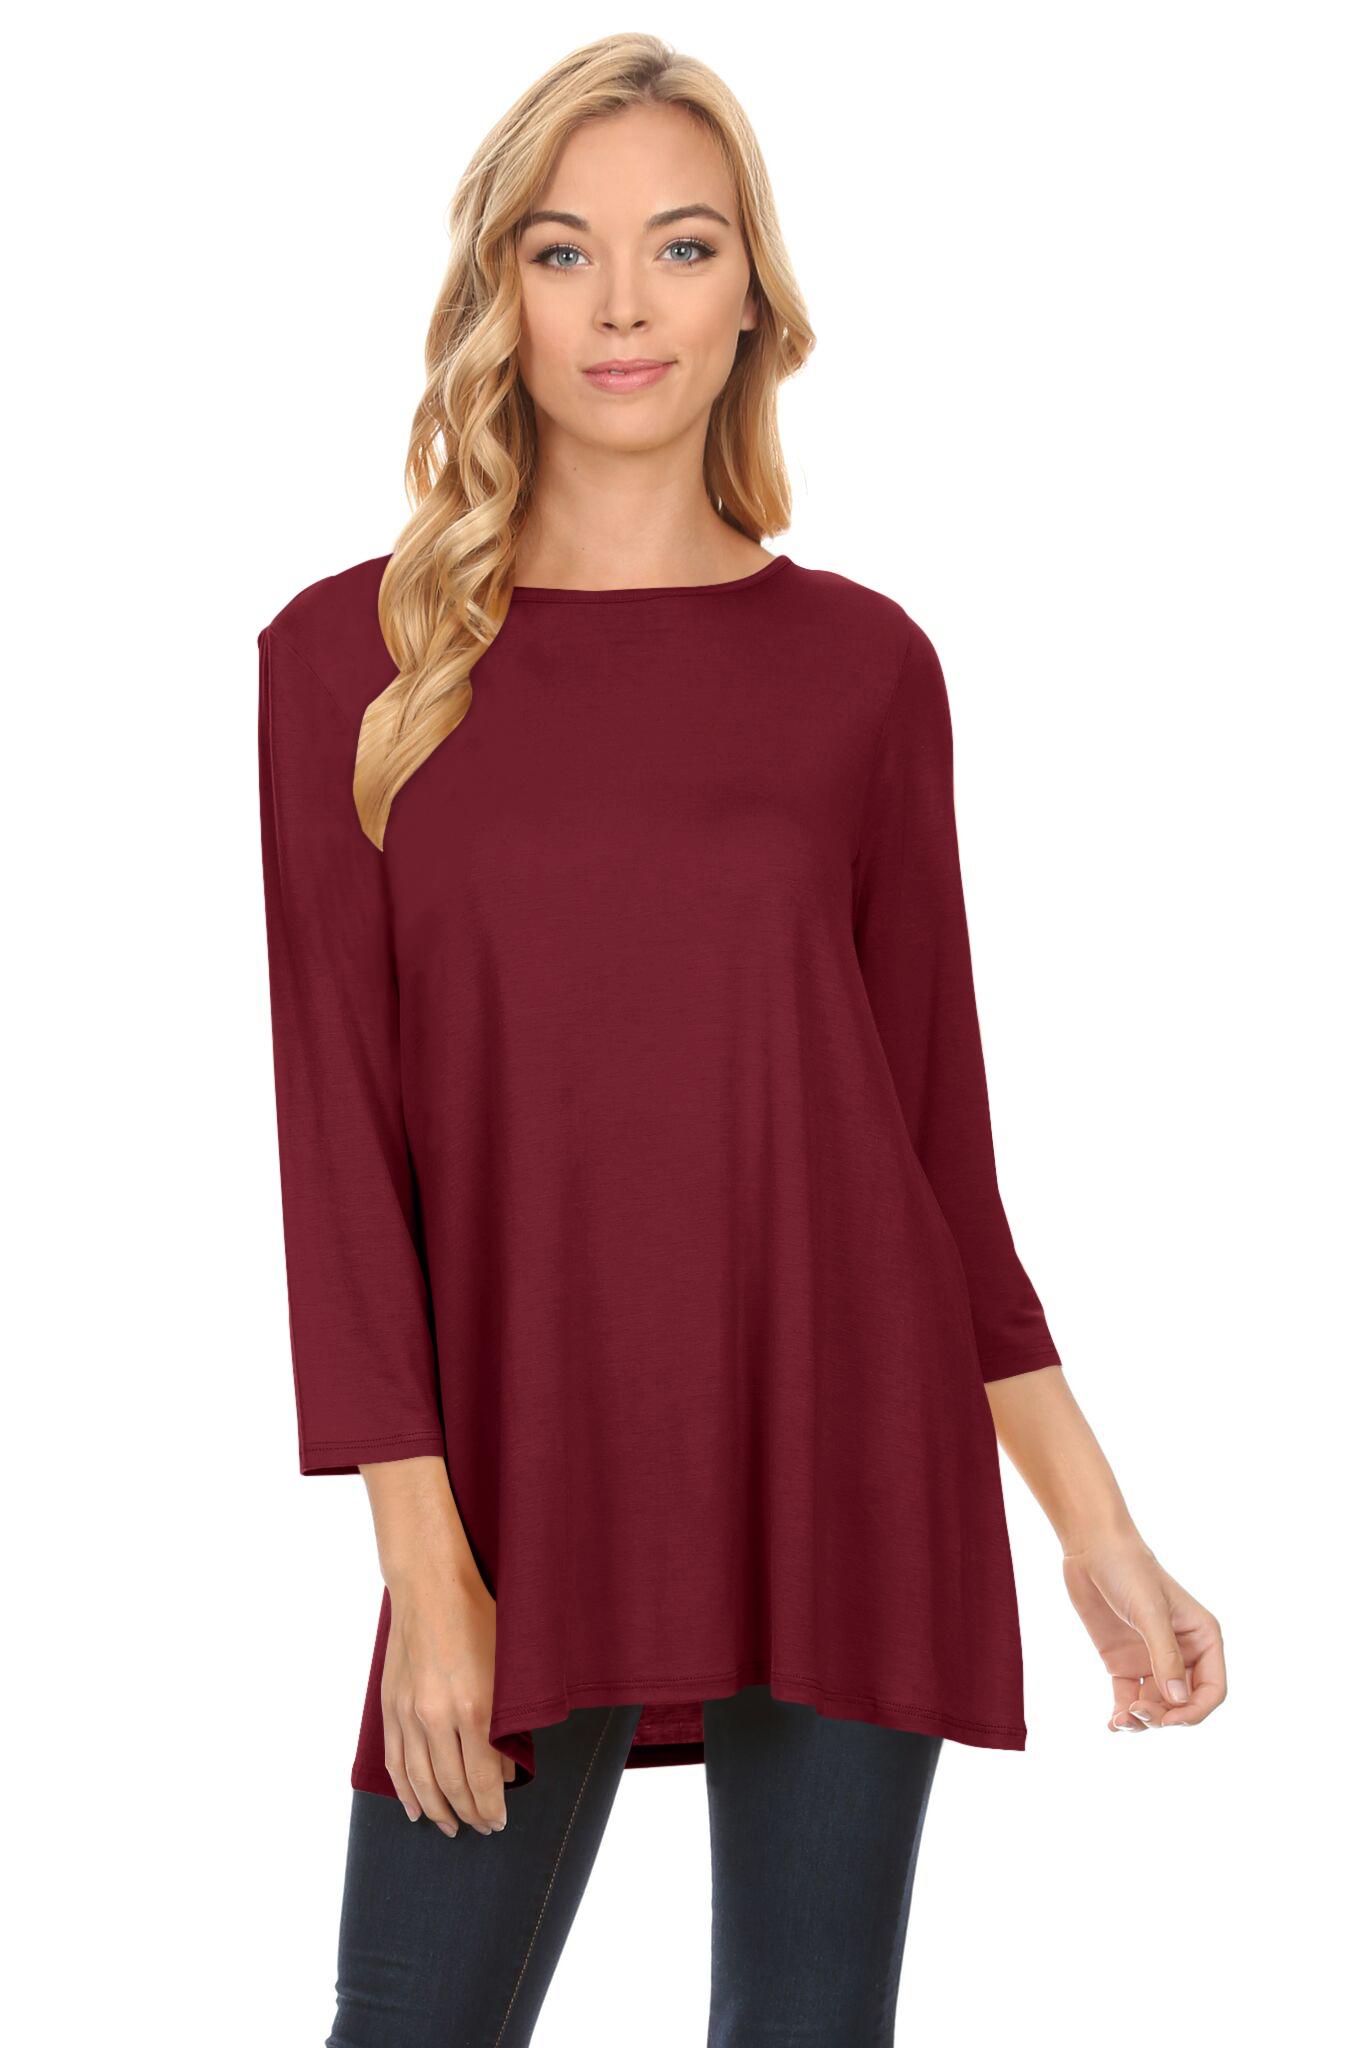 Womens Basic 3/4 Sleeve Long A-Line Top Swing Tank Top Tunic Dress ...